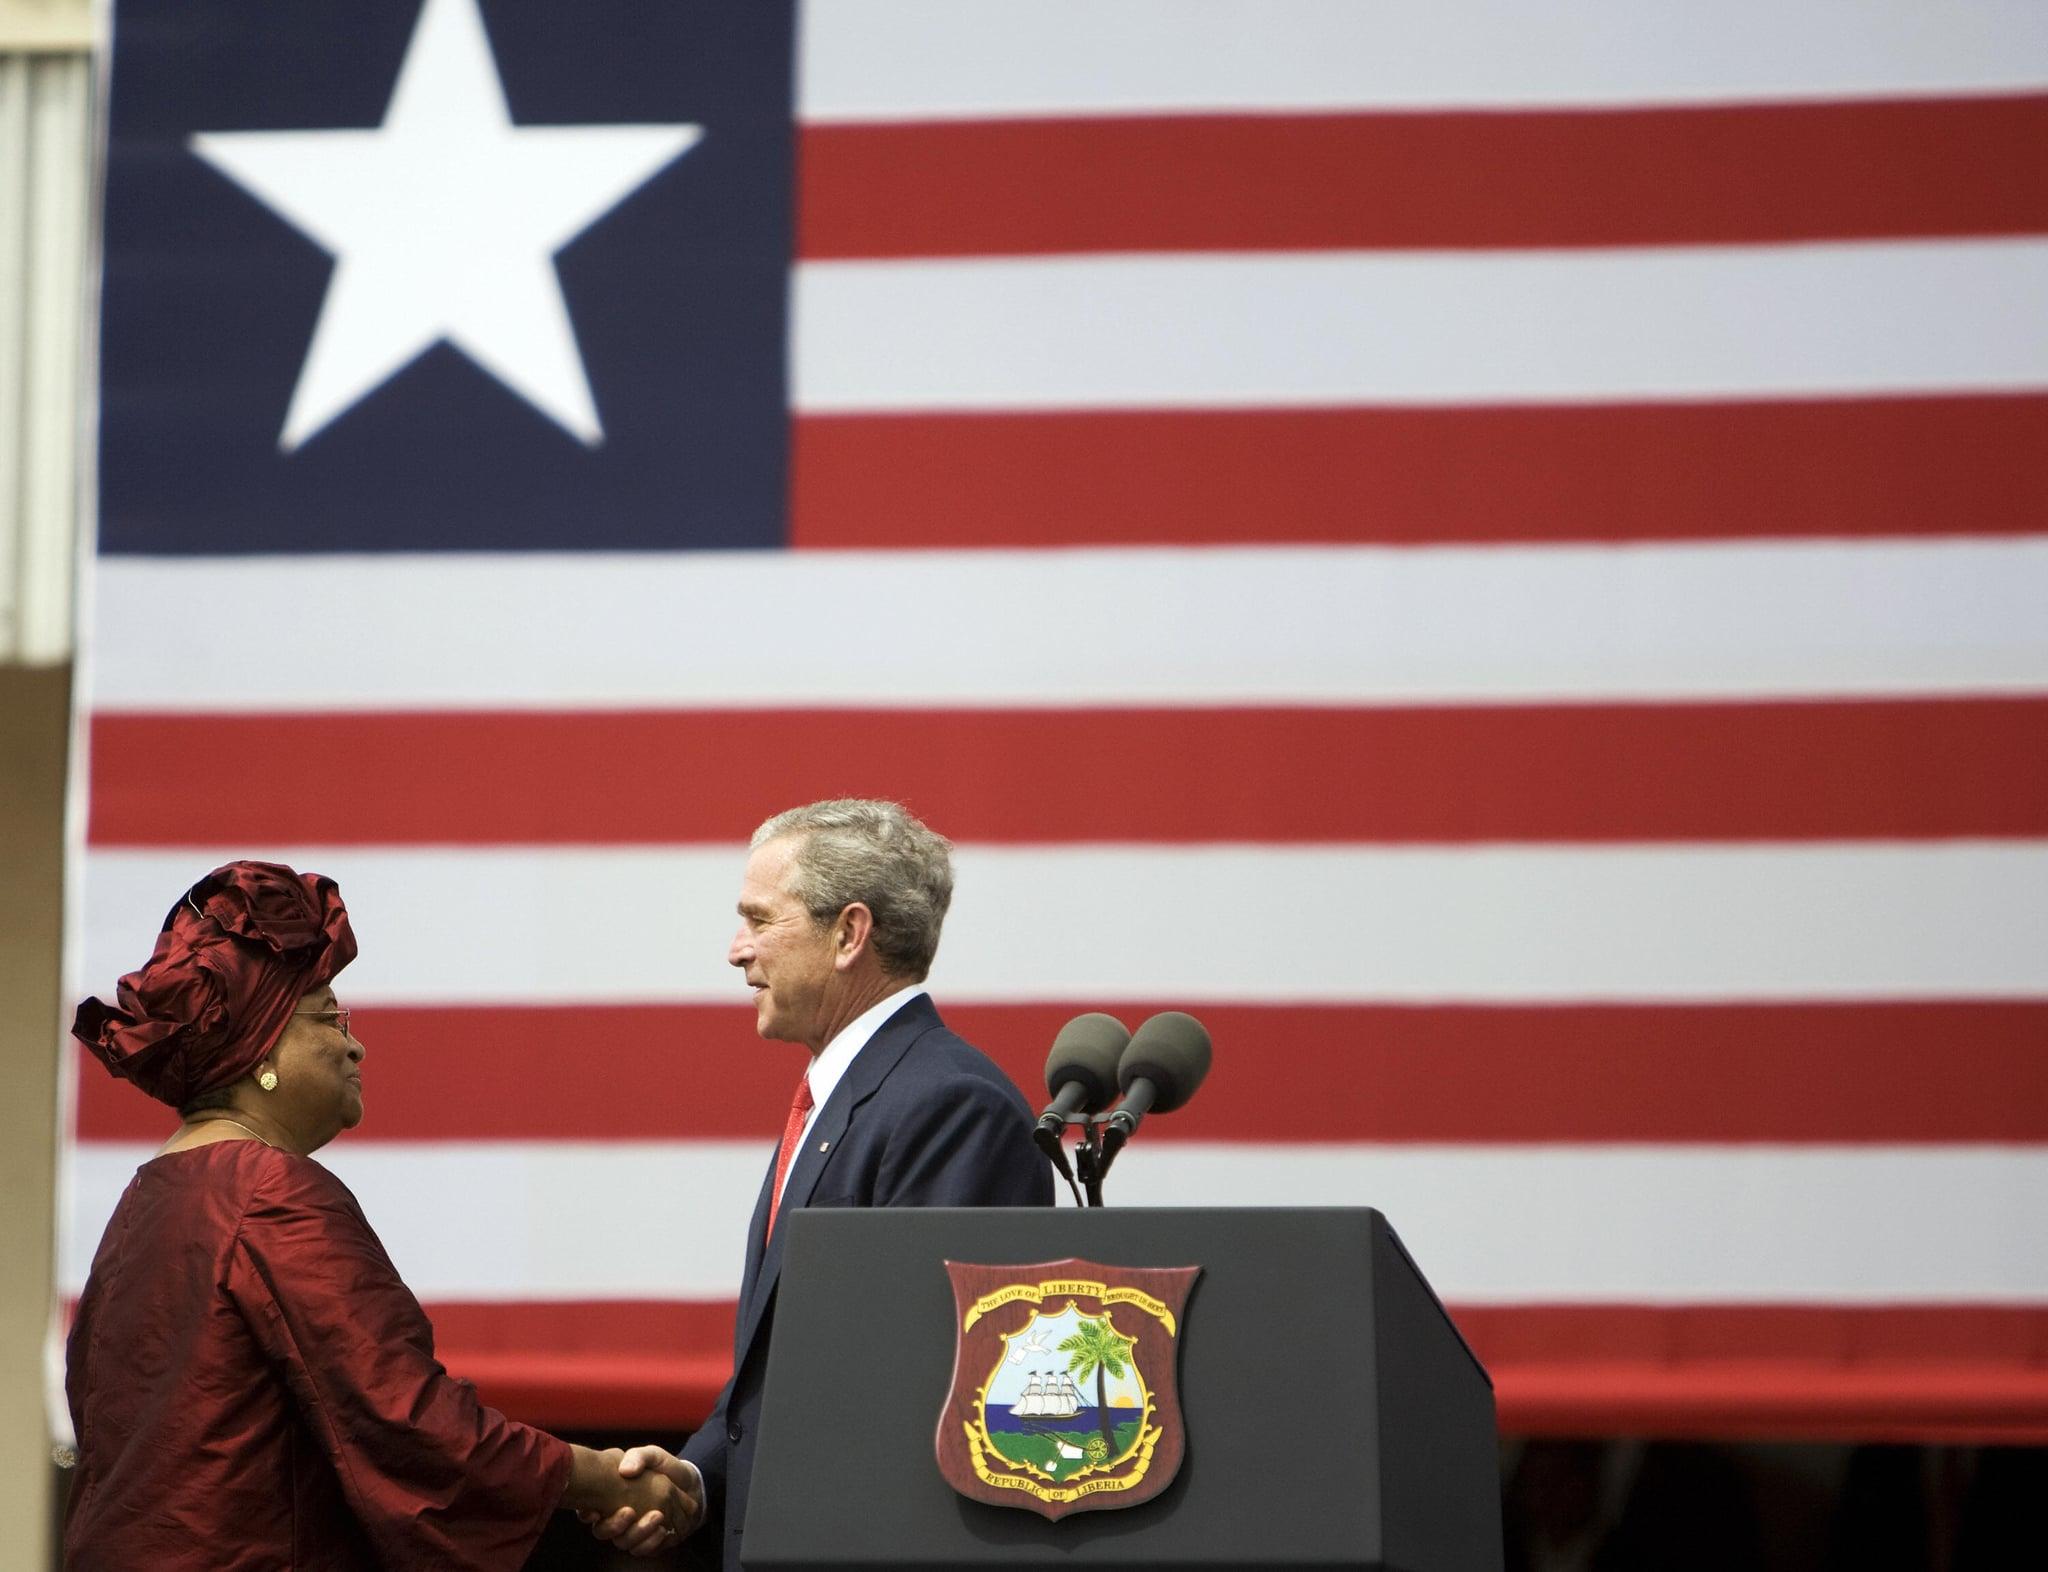 Liberia's President Ellen Johnson-Sirleaf greets Bush on February 21, 2008.